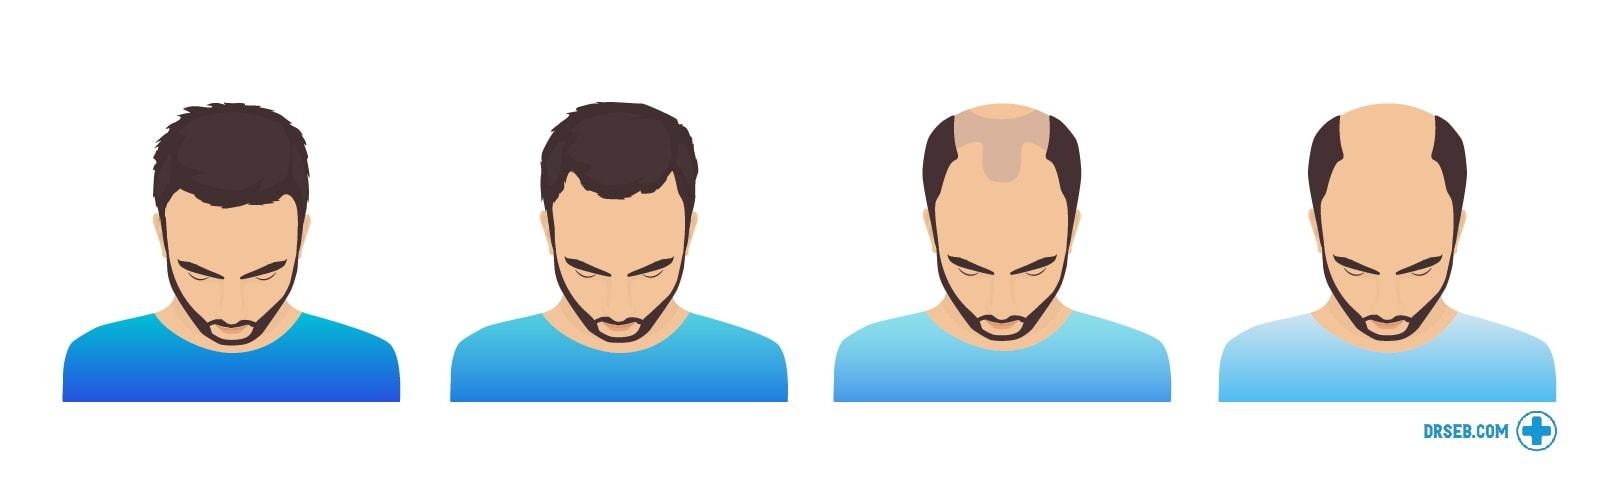 håravfall män vitaminbrist